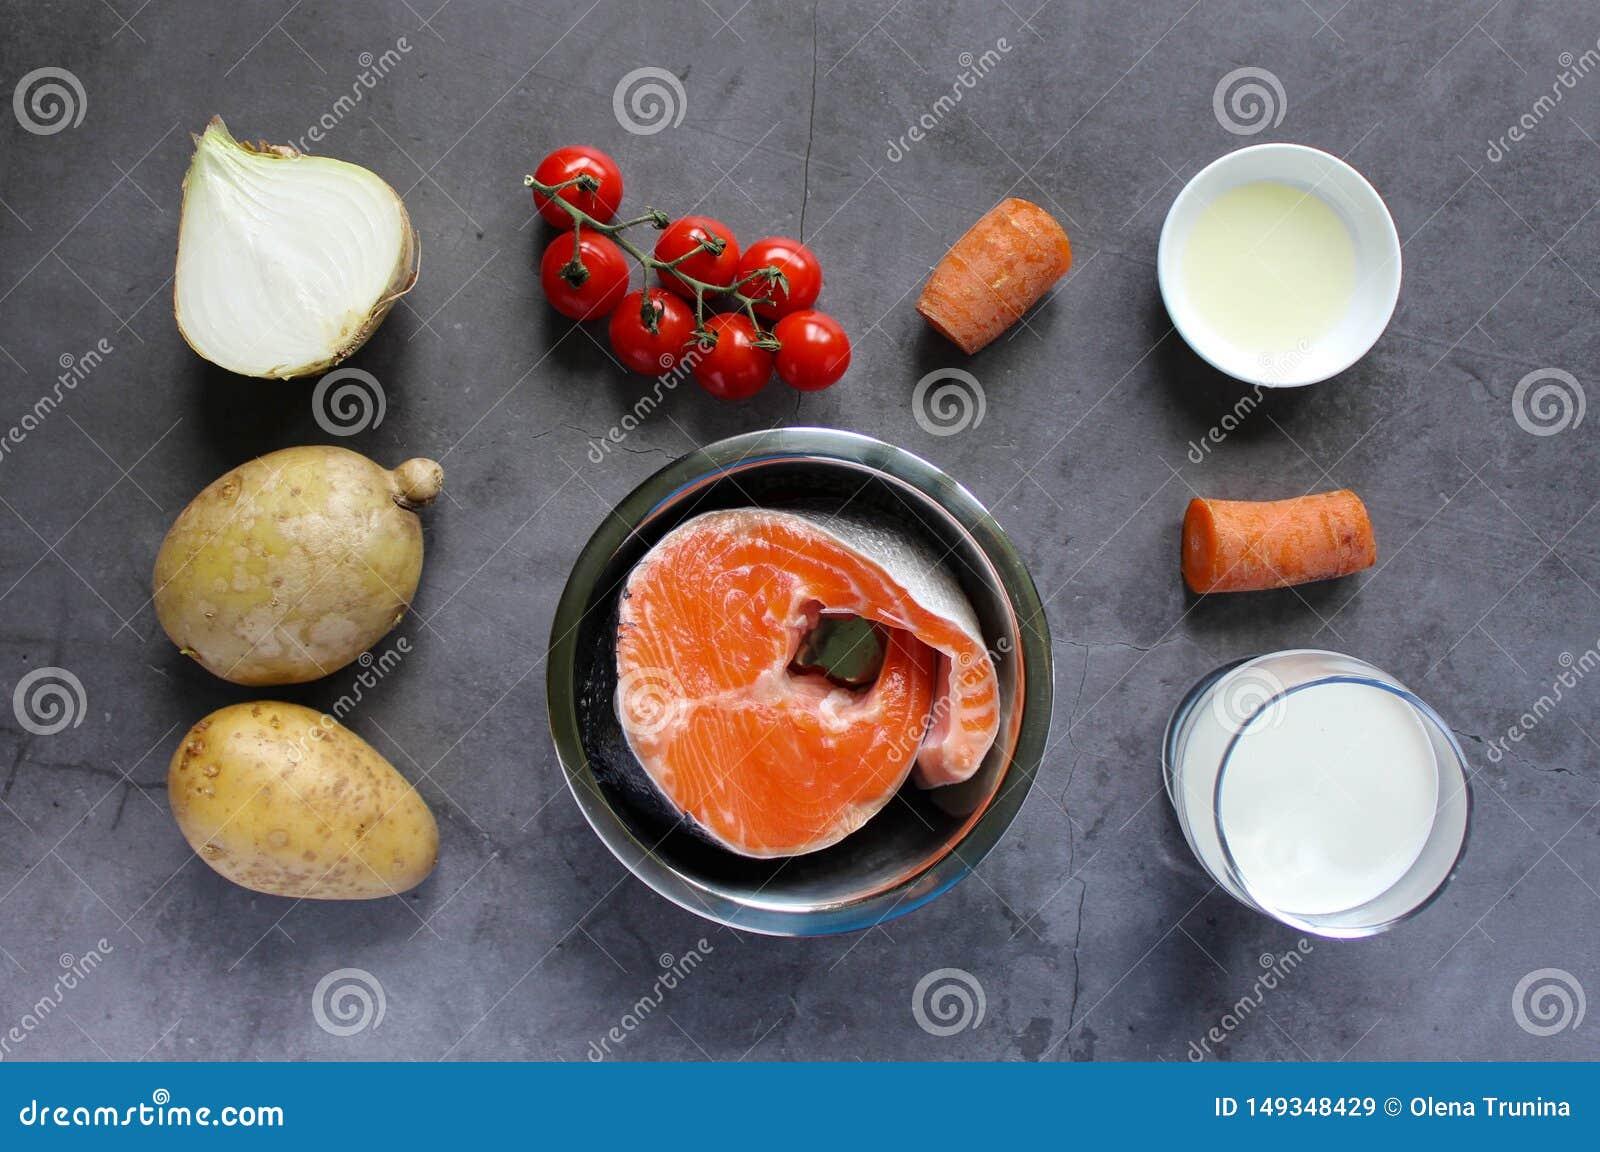 Ingredientes para a sopa dos peixes: salm?es, cebola, cenoura, batata, tomates de cereja, creme, azeite